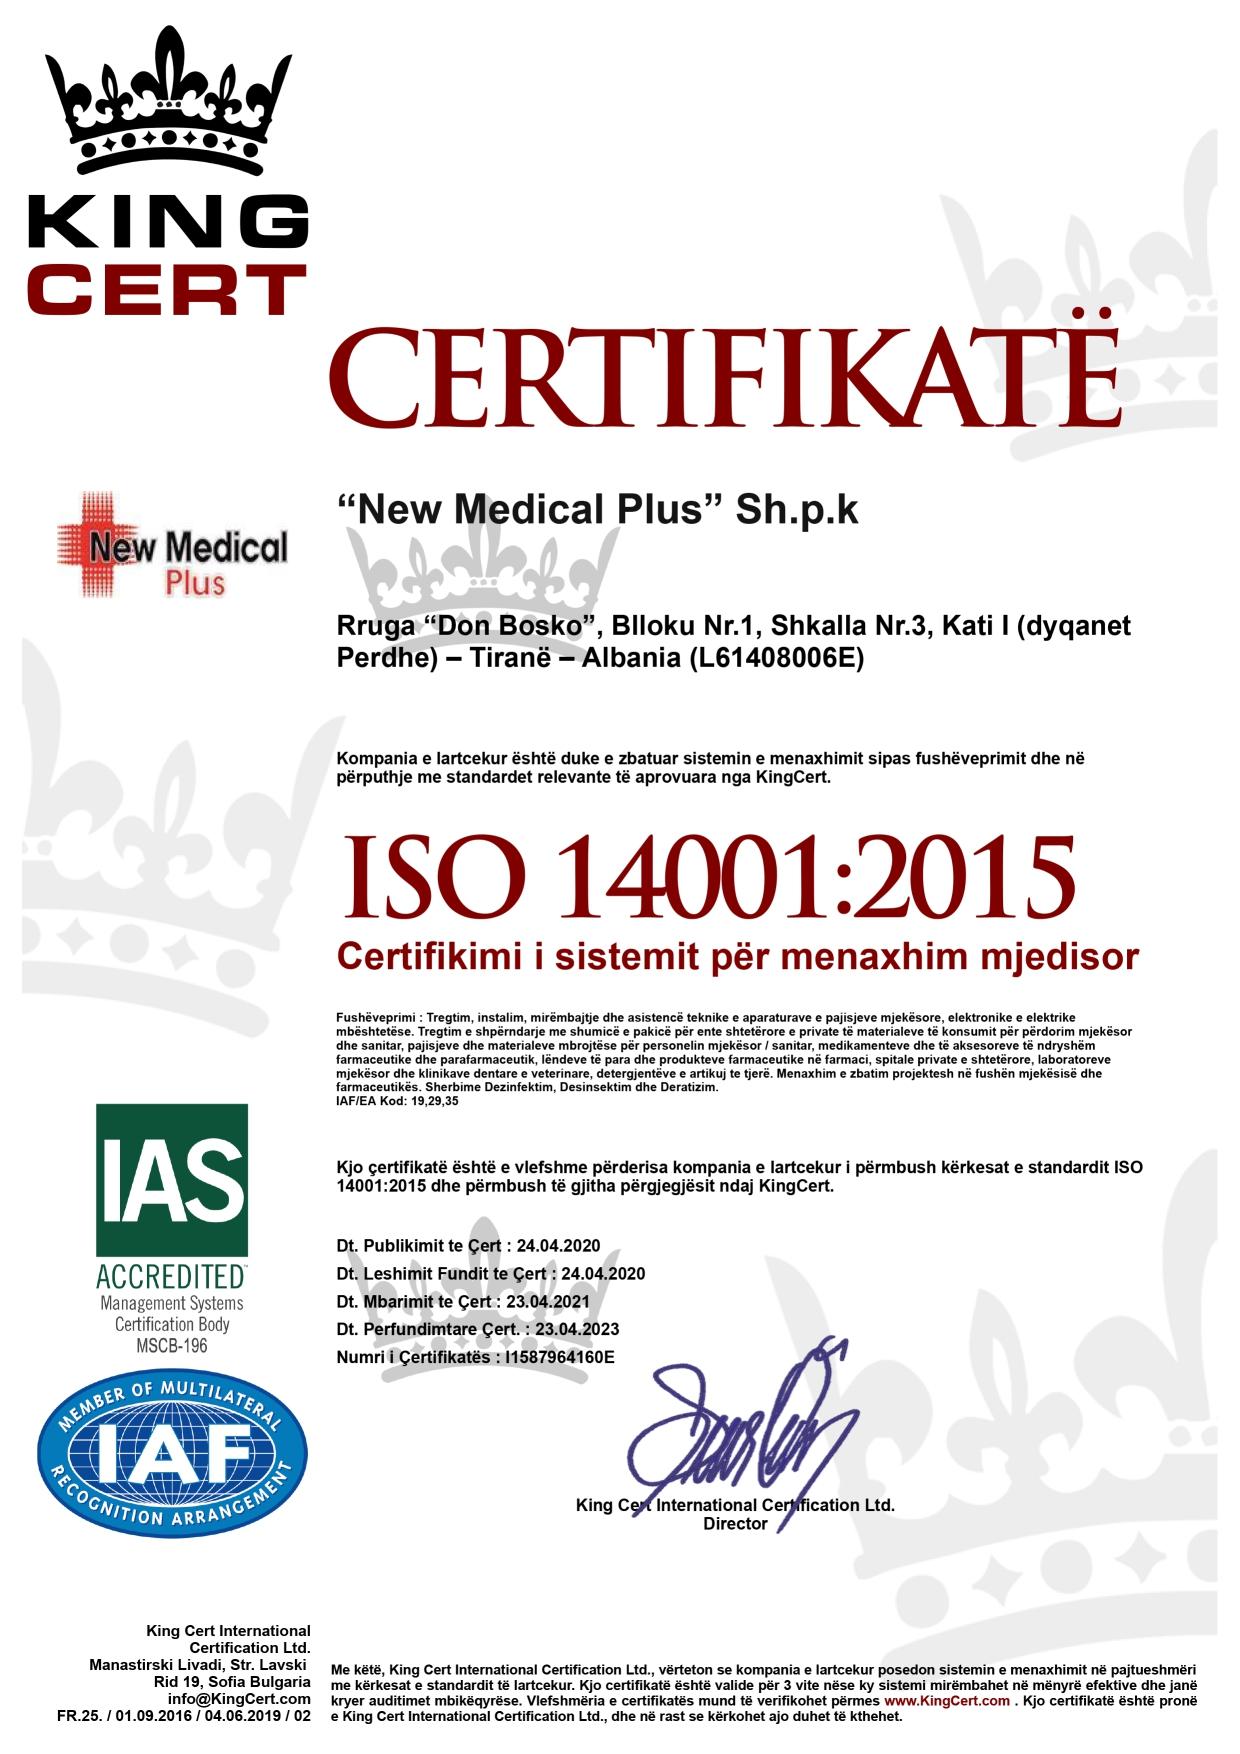 NEW MEDICAL PLUS WEBSITE CERTIFIKATA 9